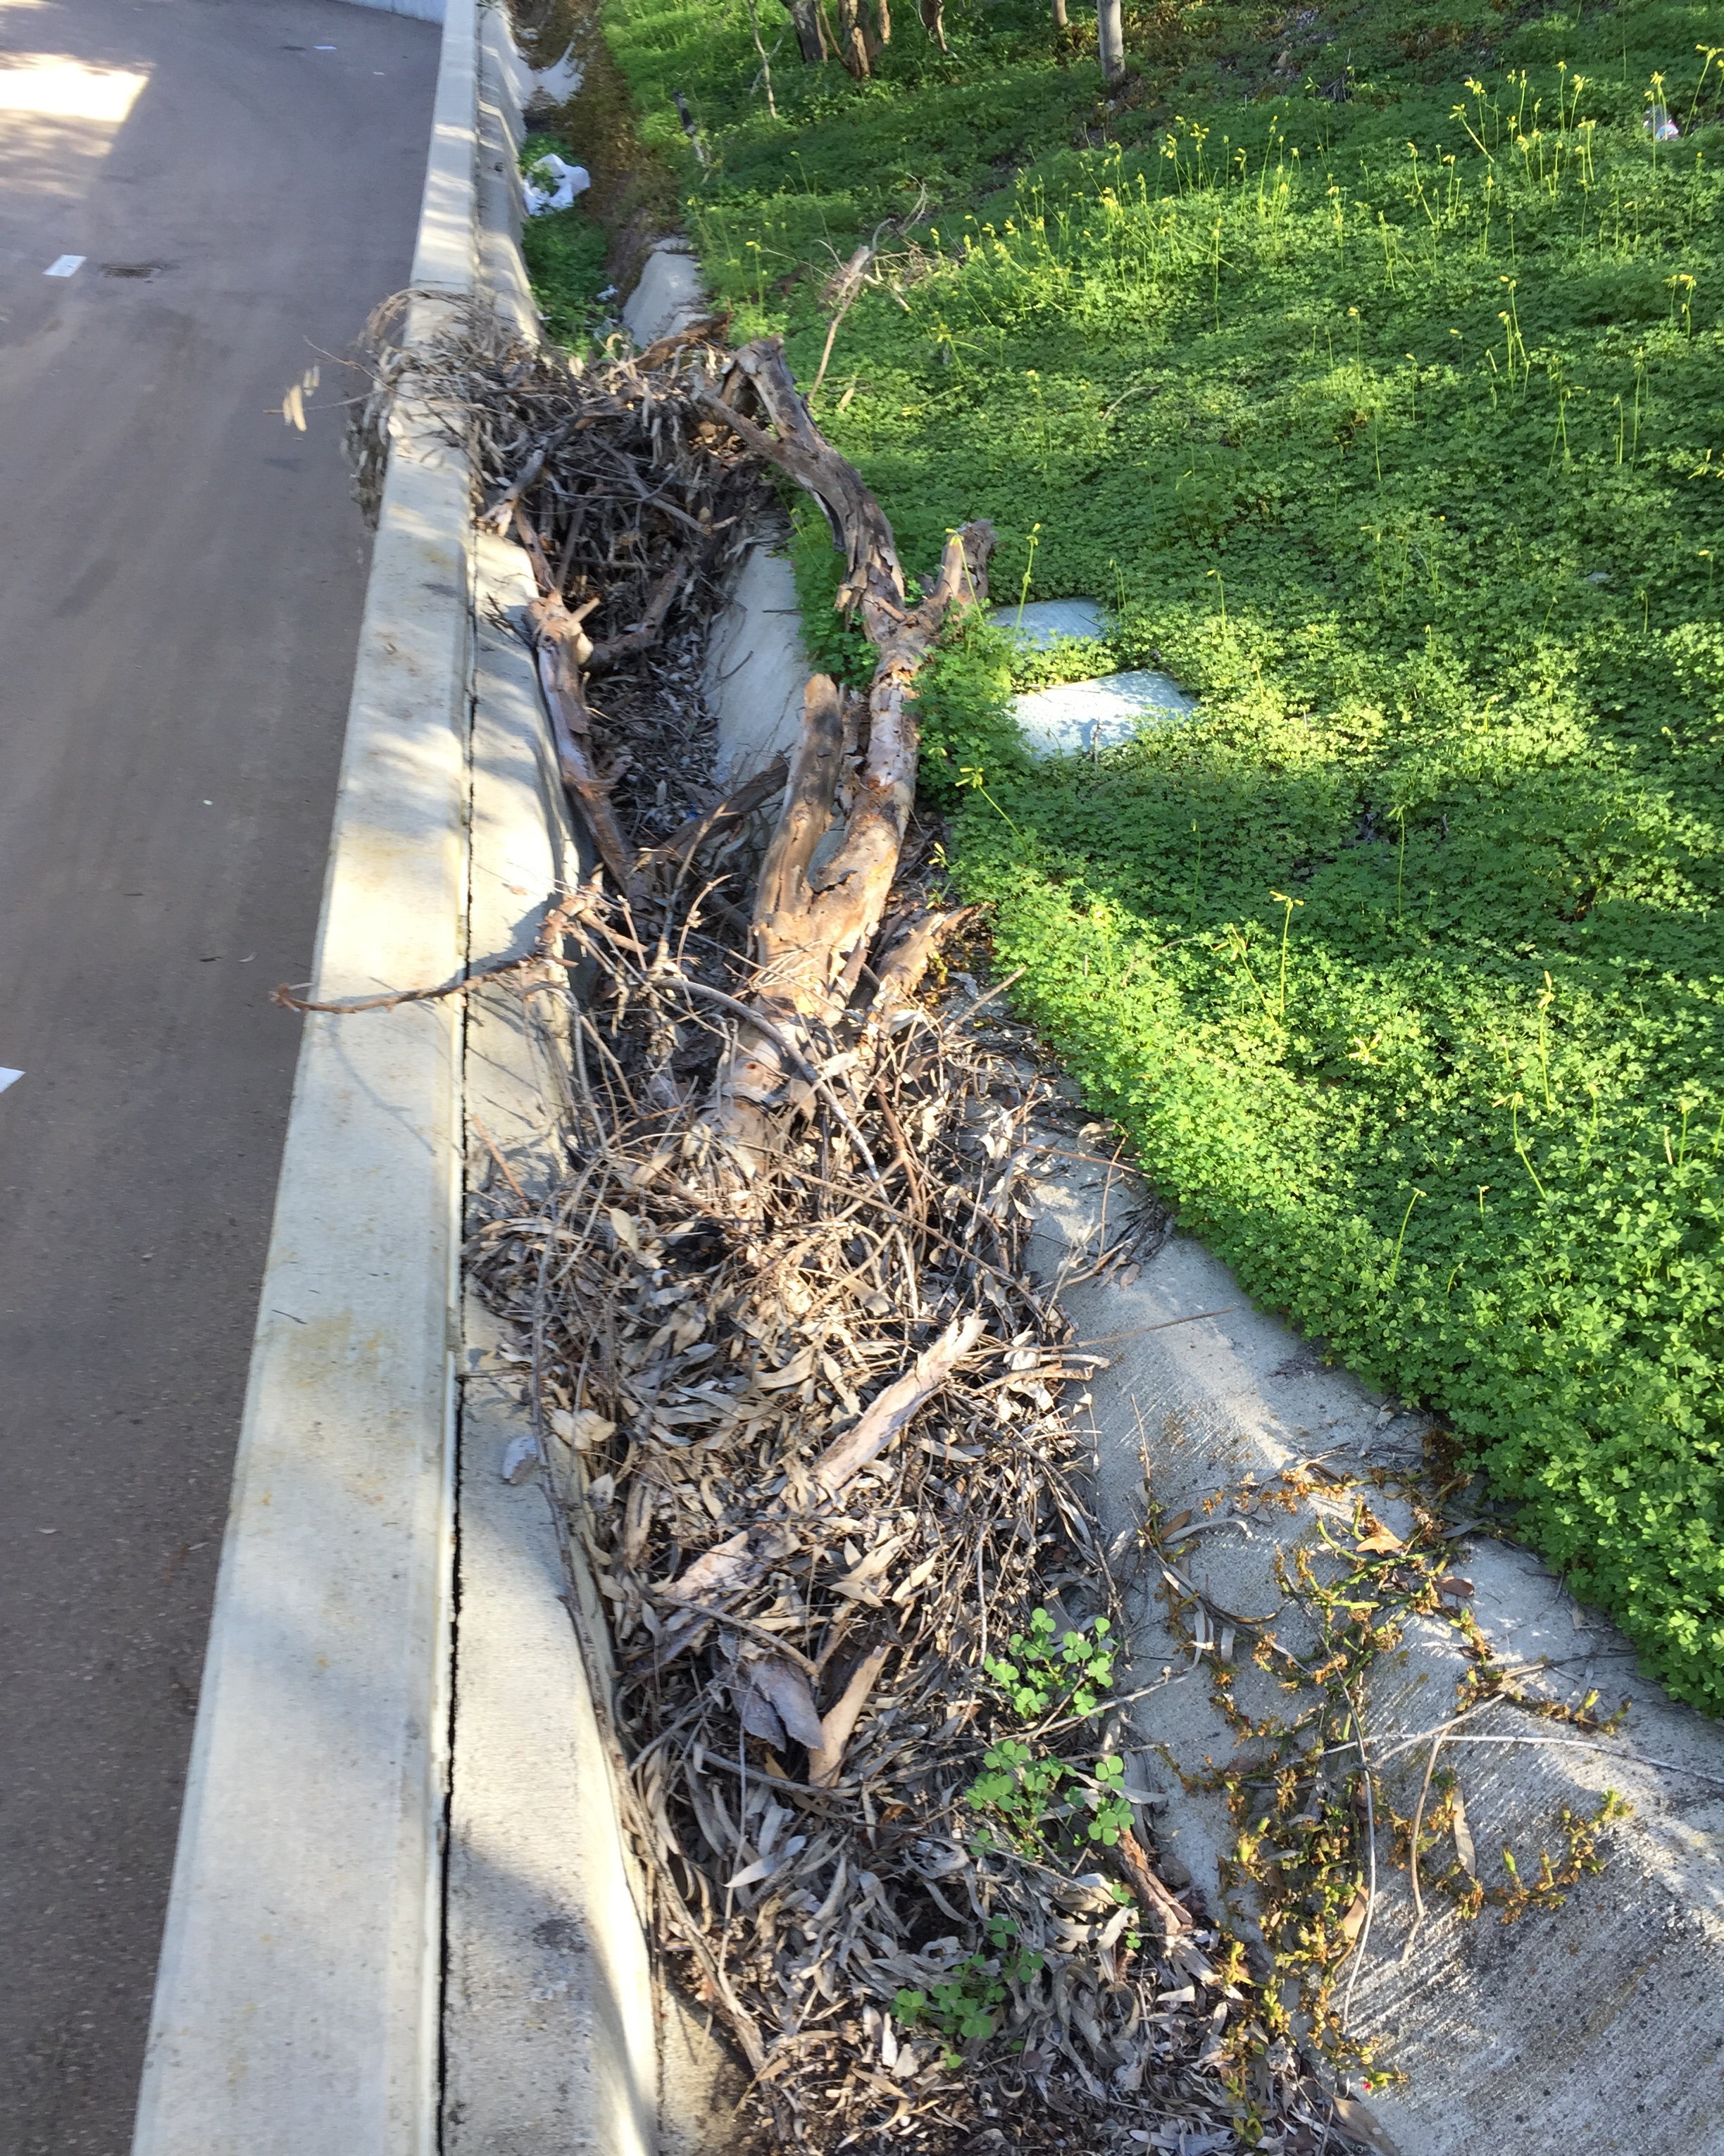 stormwater culvert needs service